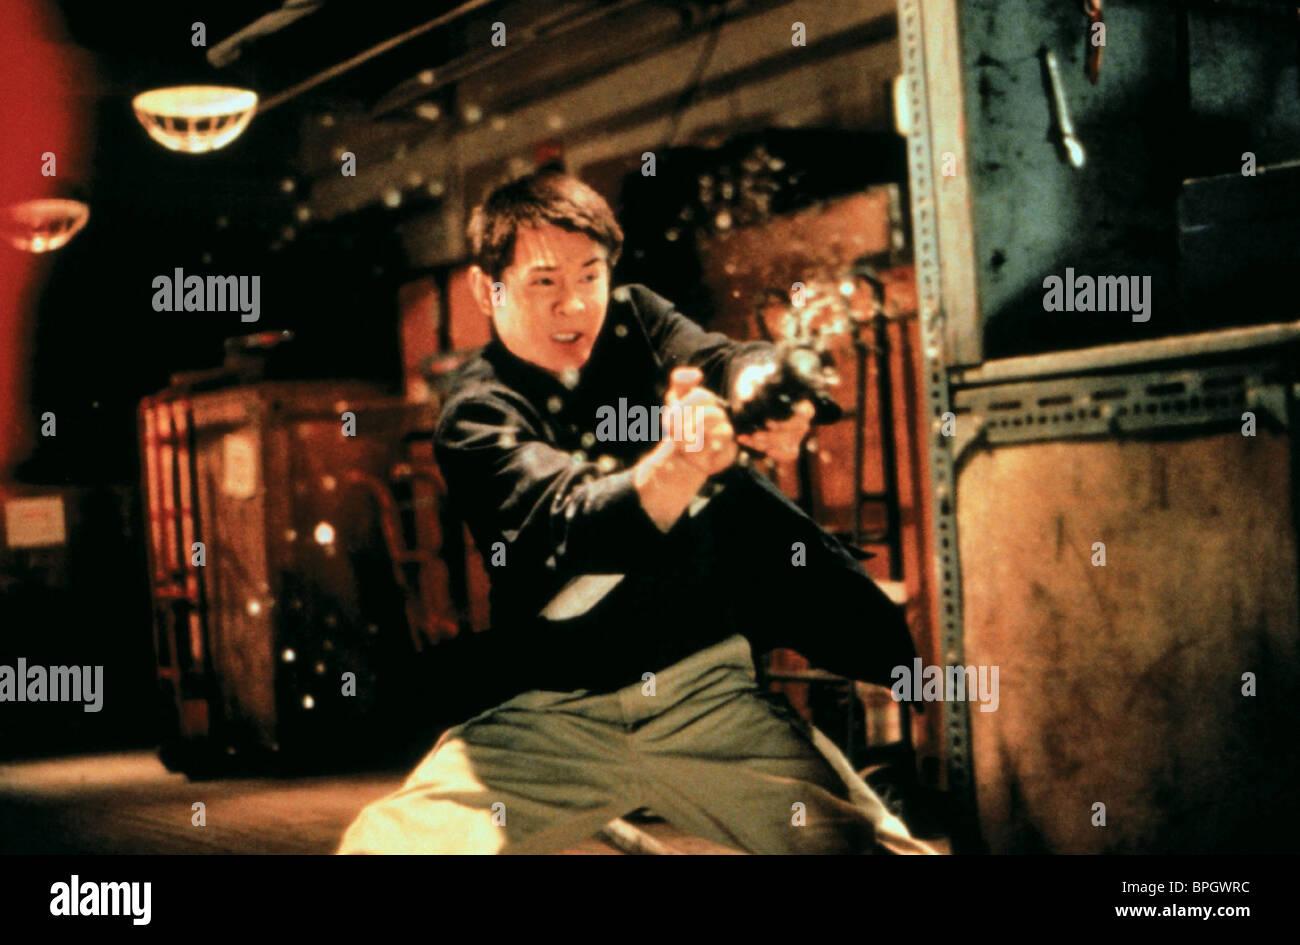 jet li romeo must die 2000 - Romeo Must Com